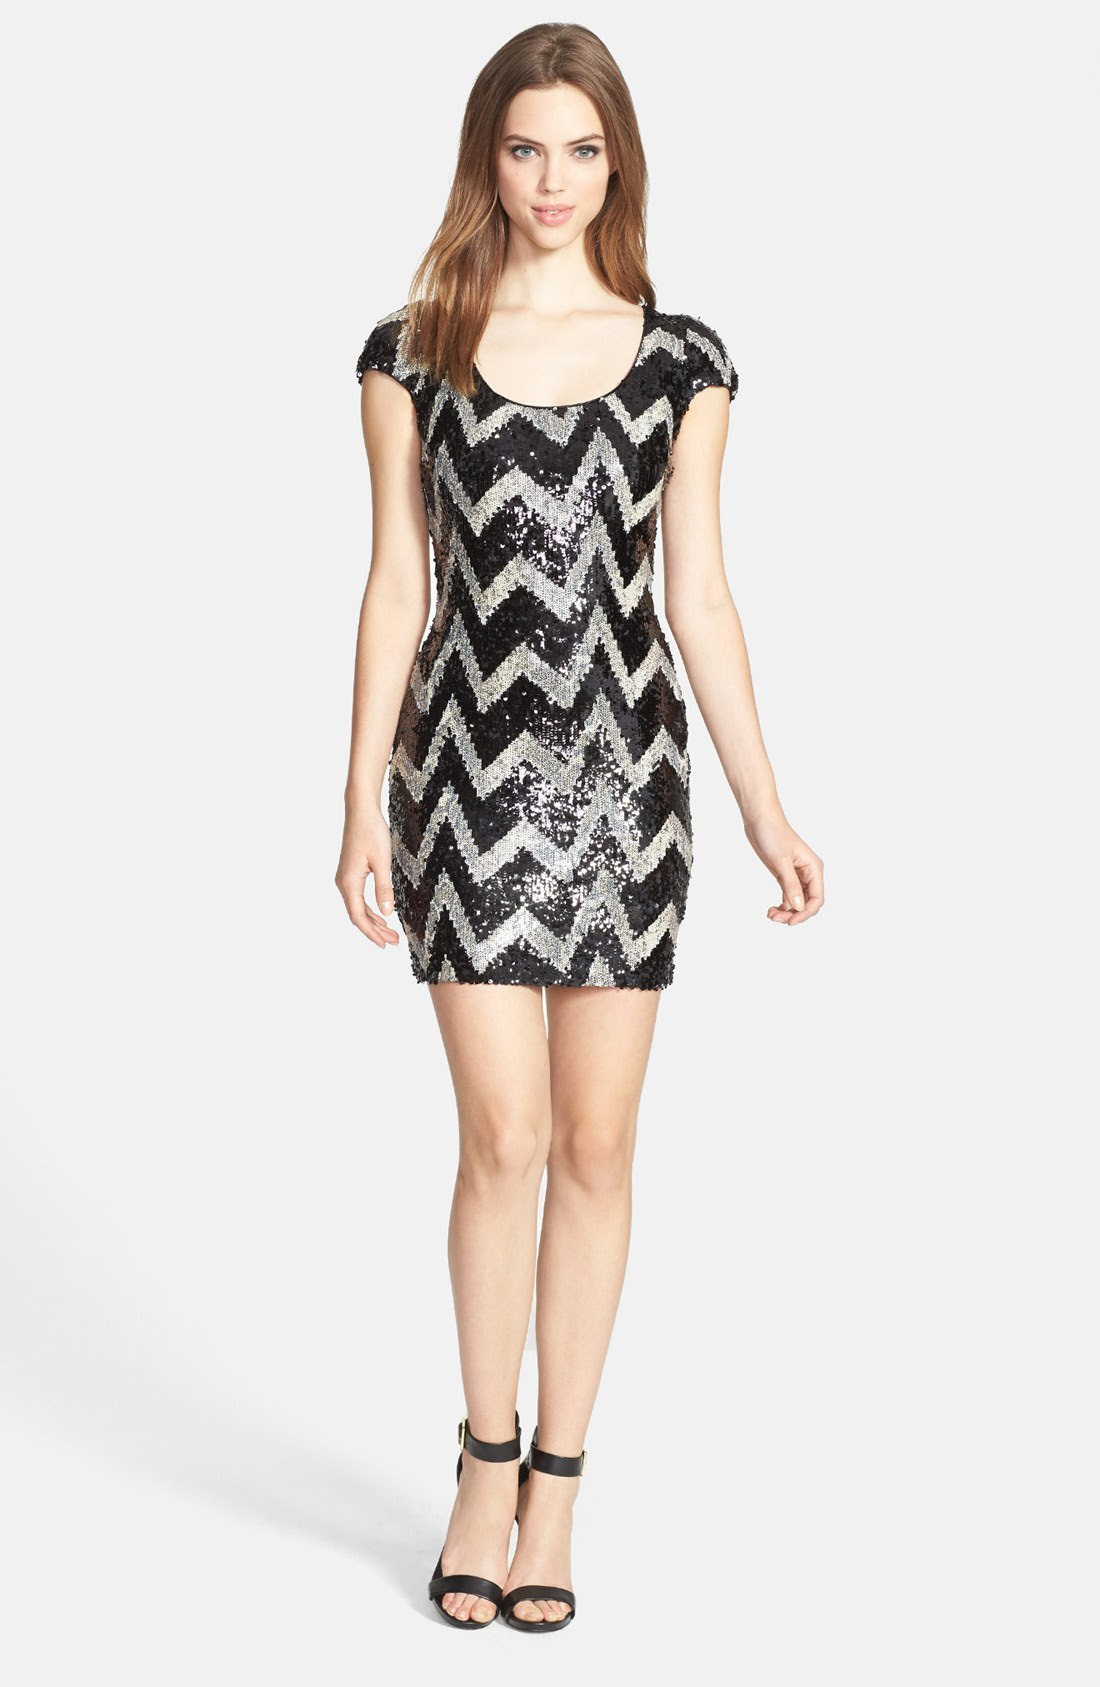 Sequin chevron stripes bodycon party dress mini